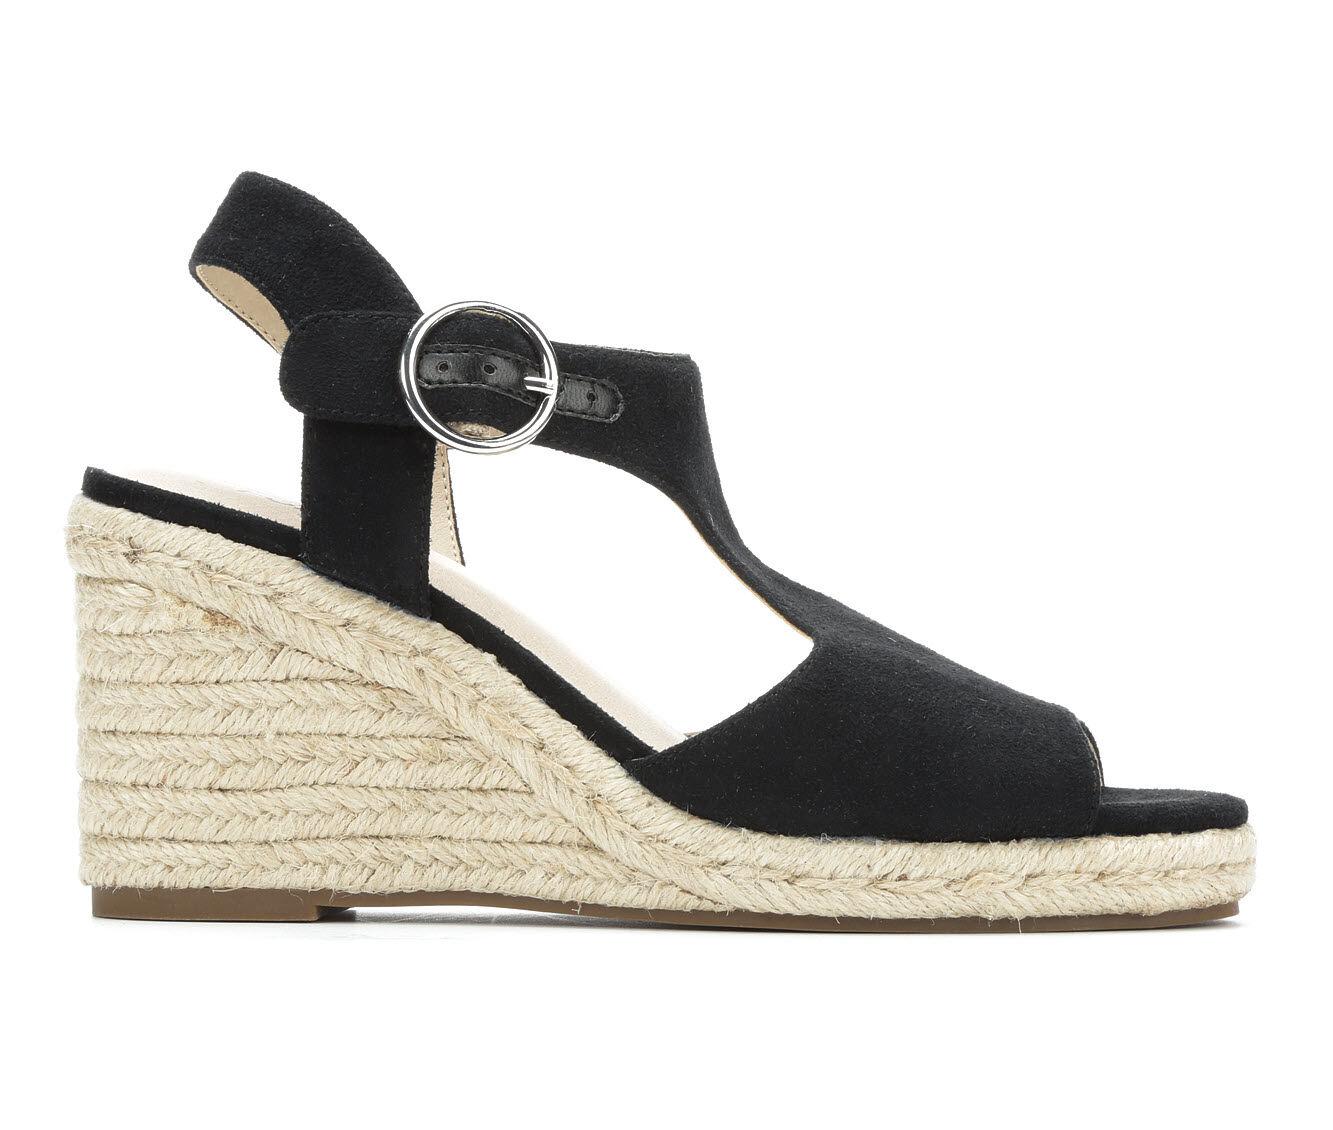 uk shoes_kd5741